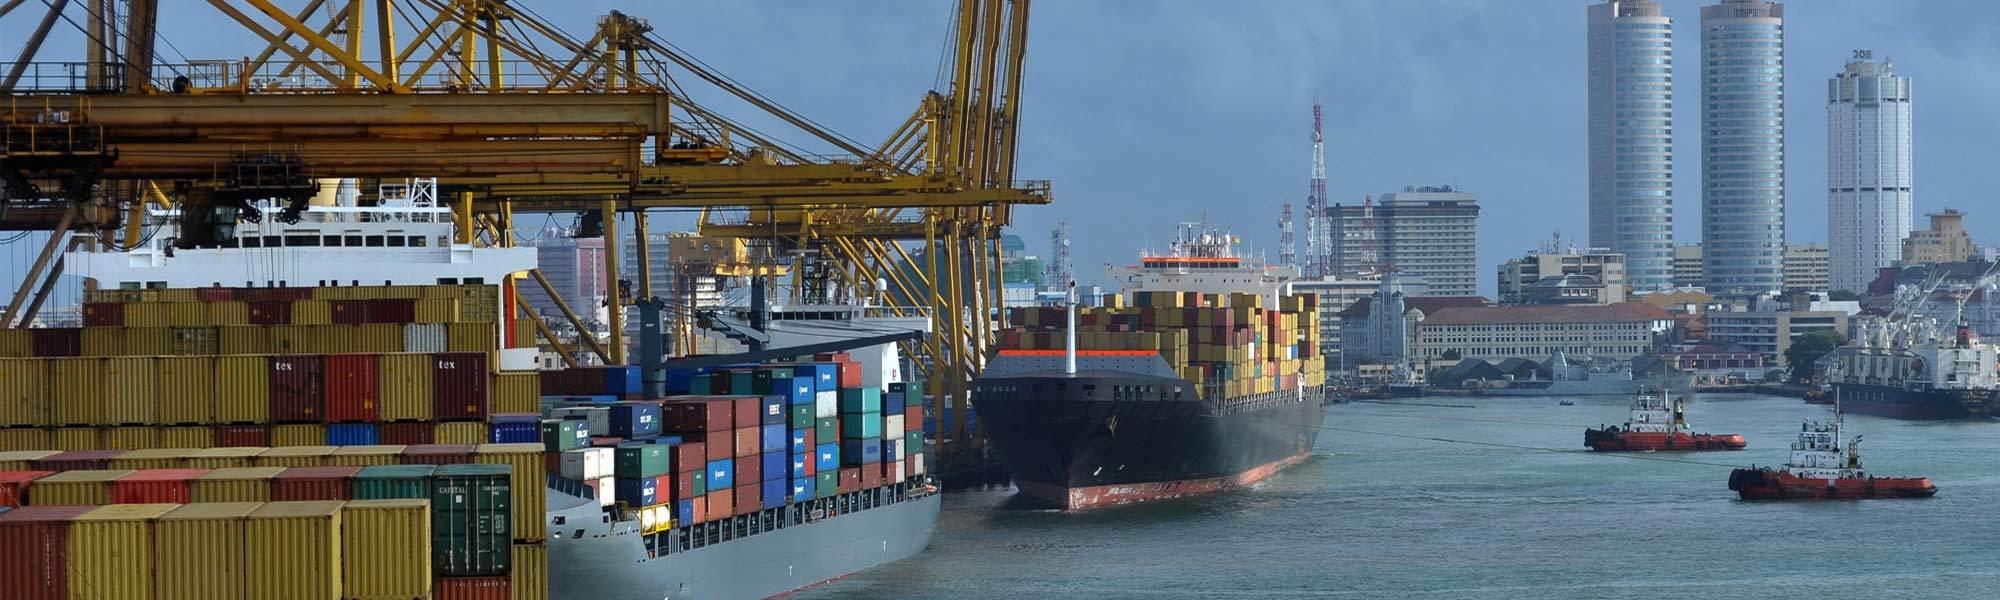 Hayleys Advantis Shipping